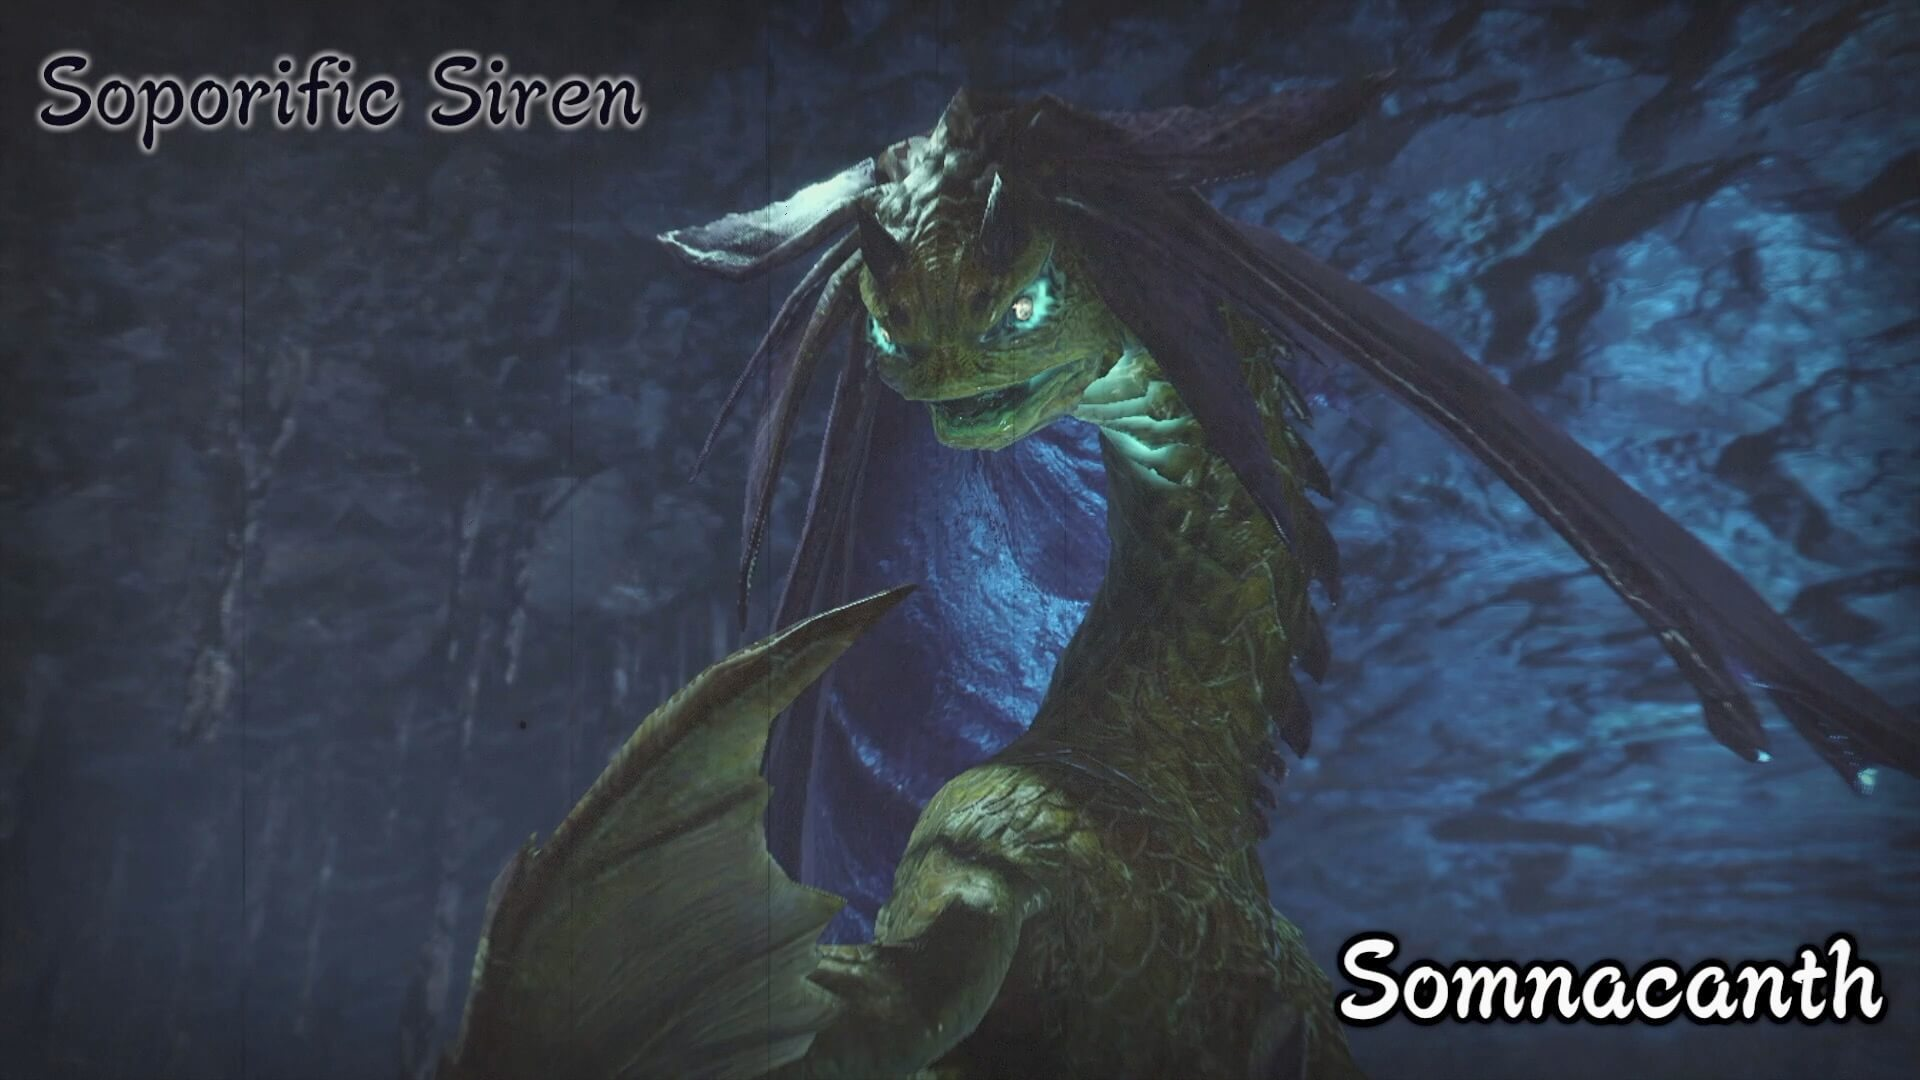 Soporific Siren